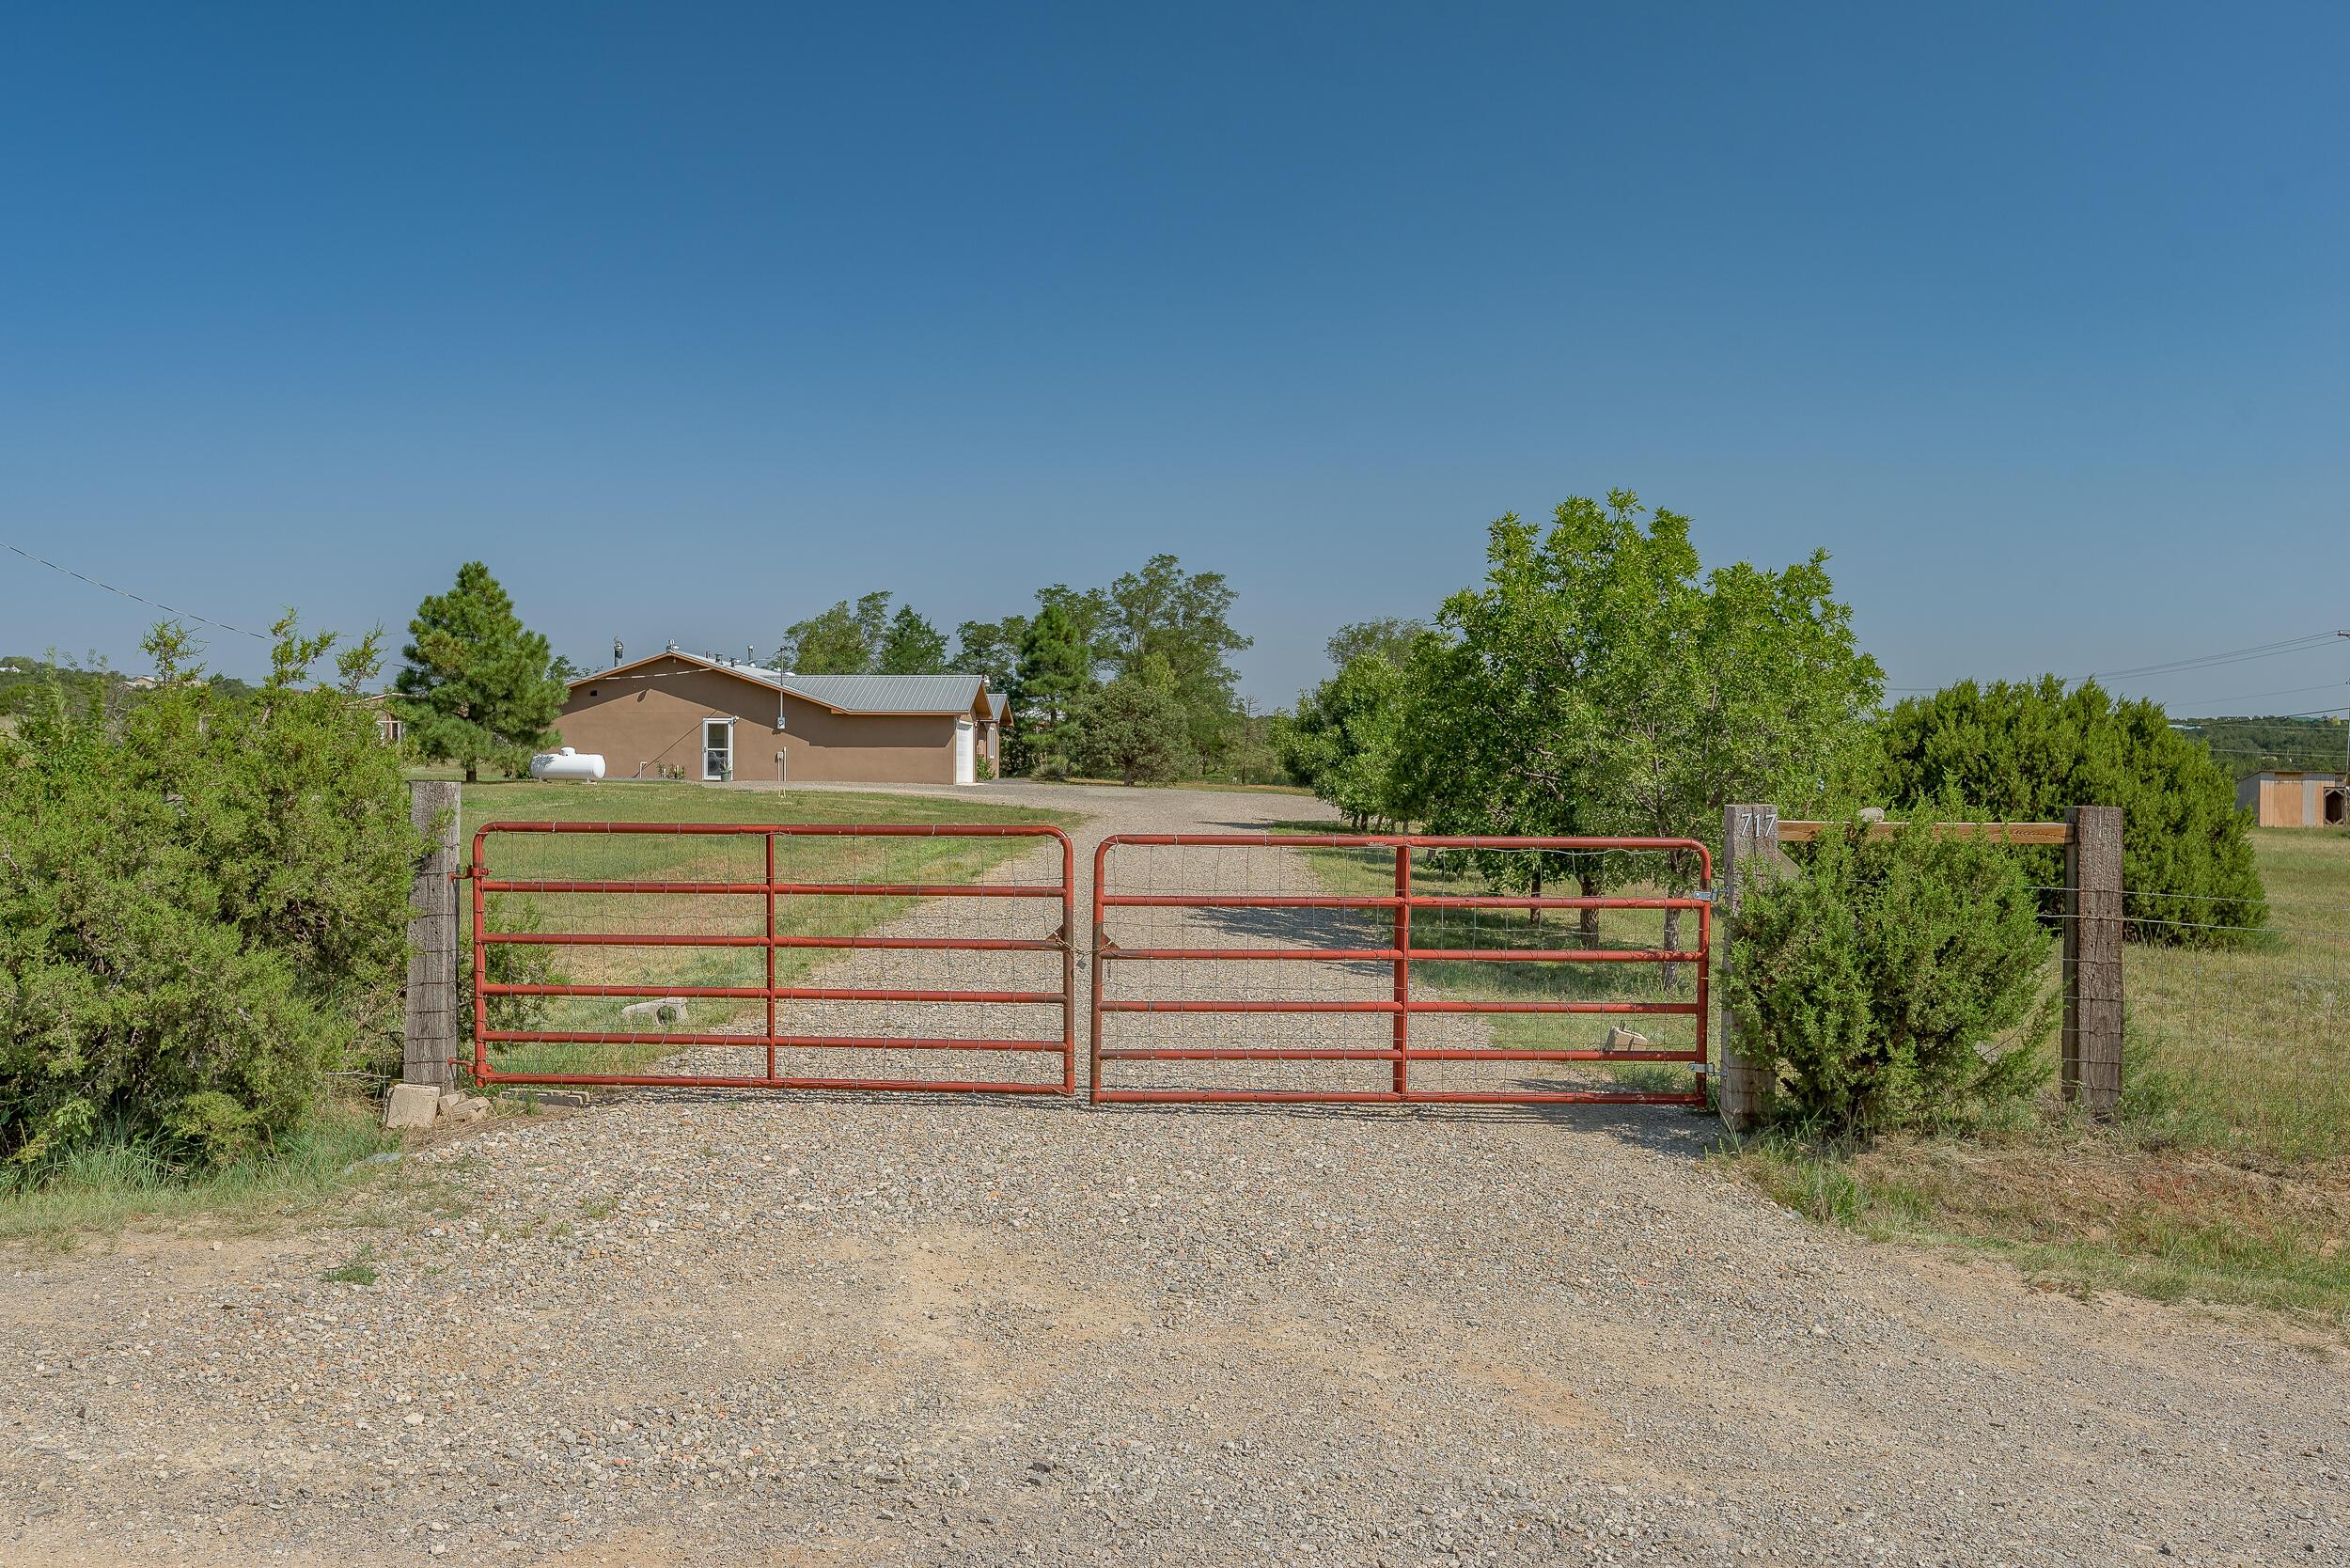 717 Nm 217 Property Photo 1